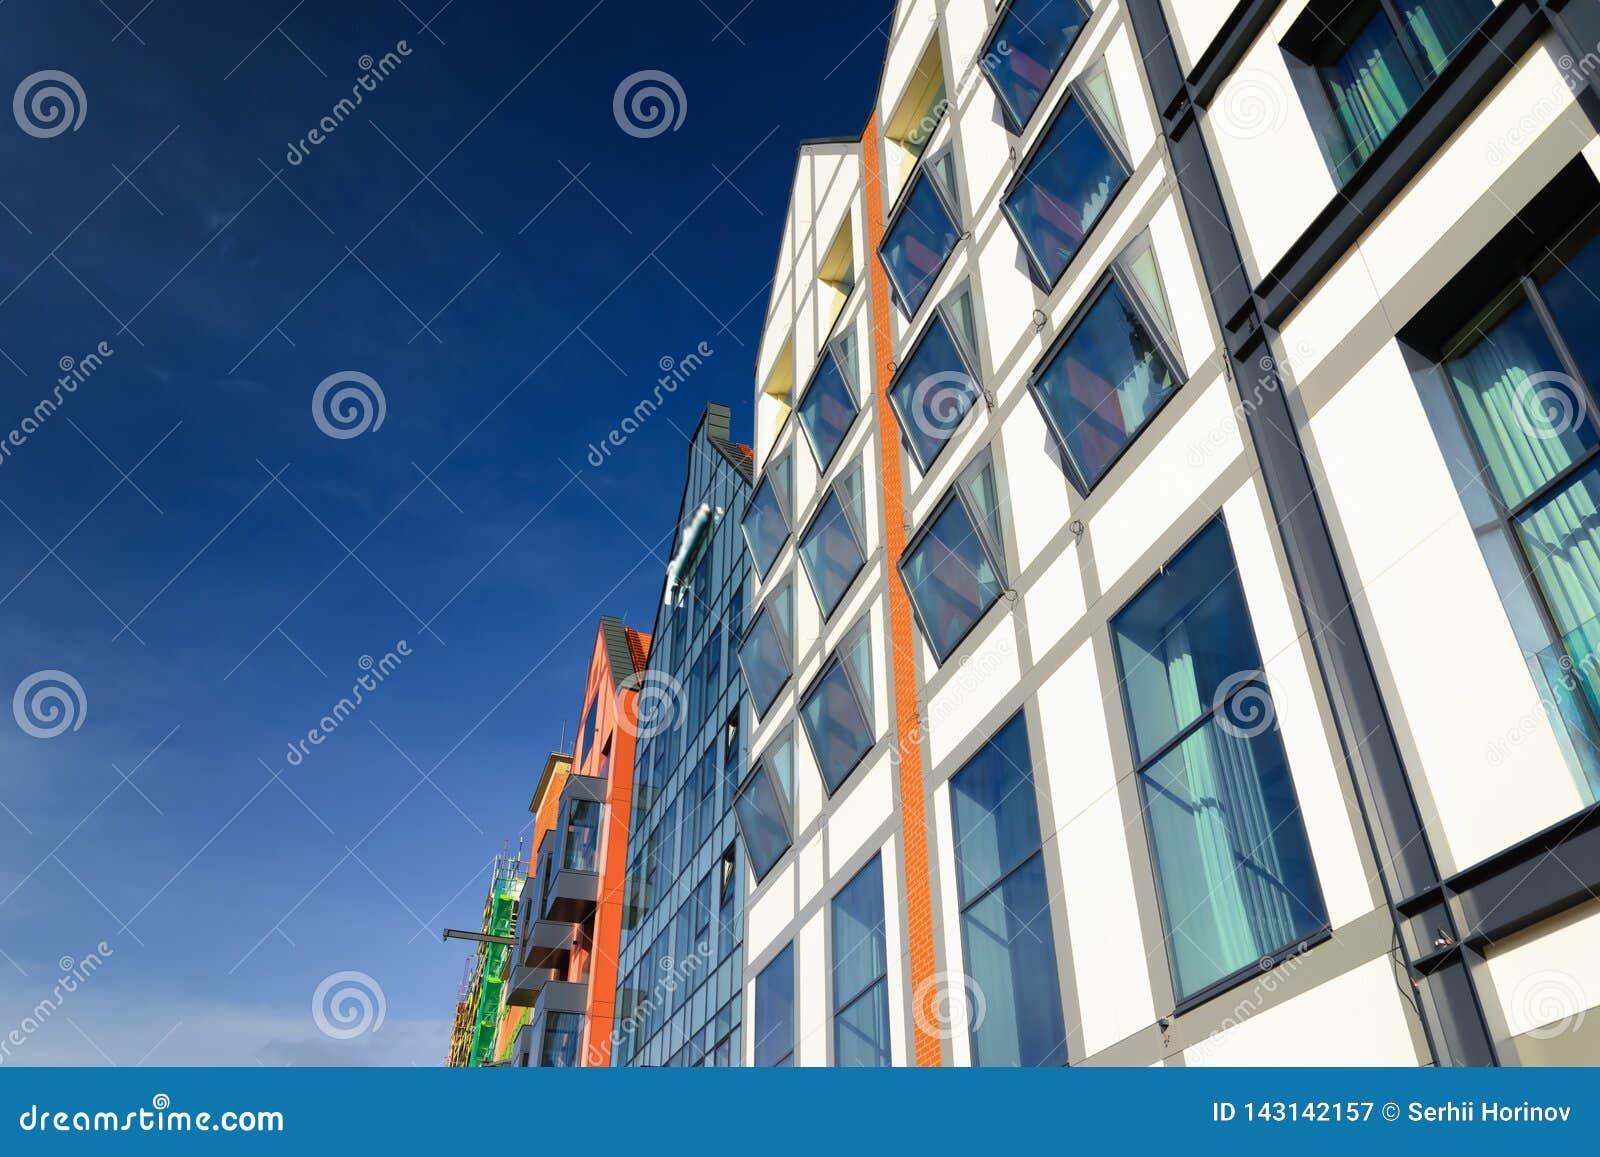 Glass modern building in Gdansk, Poland